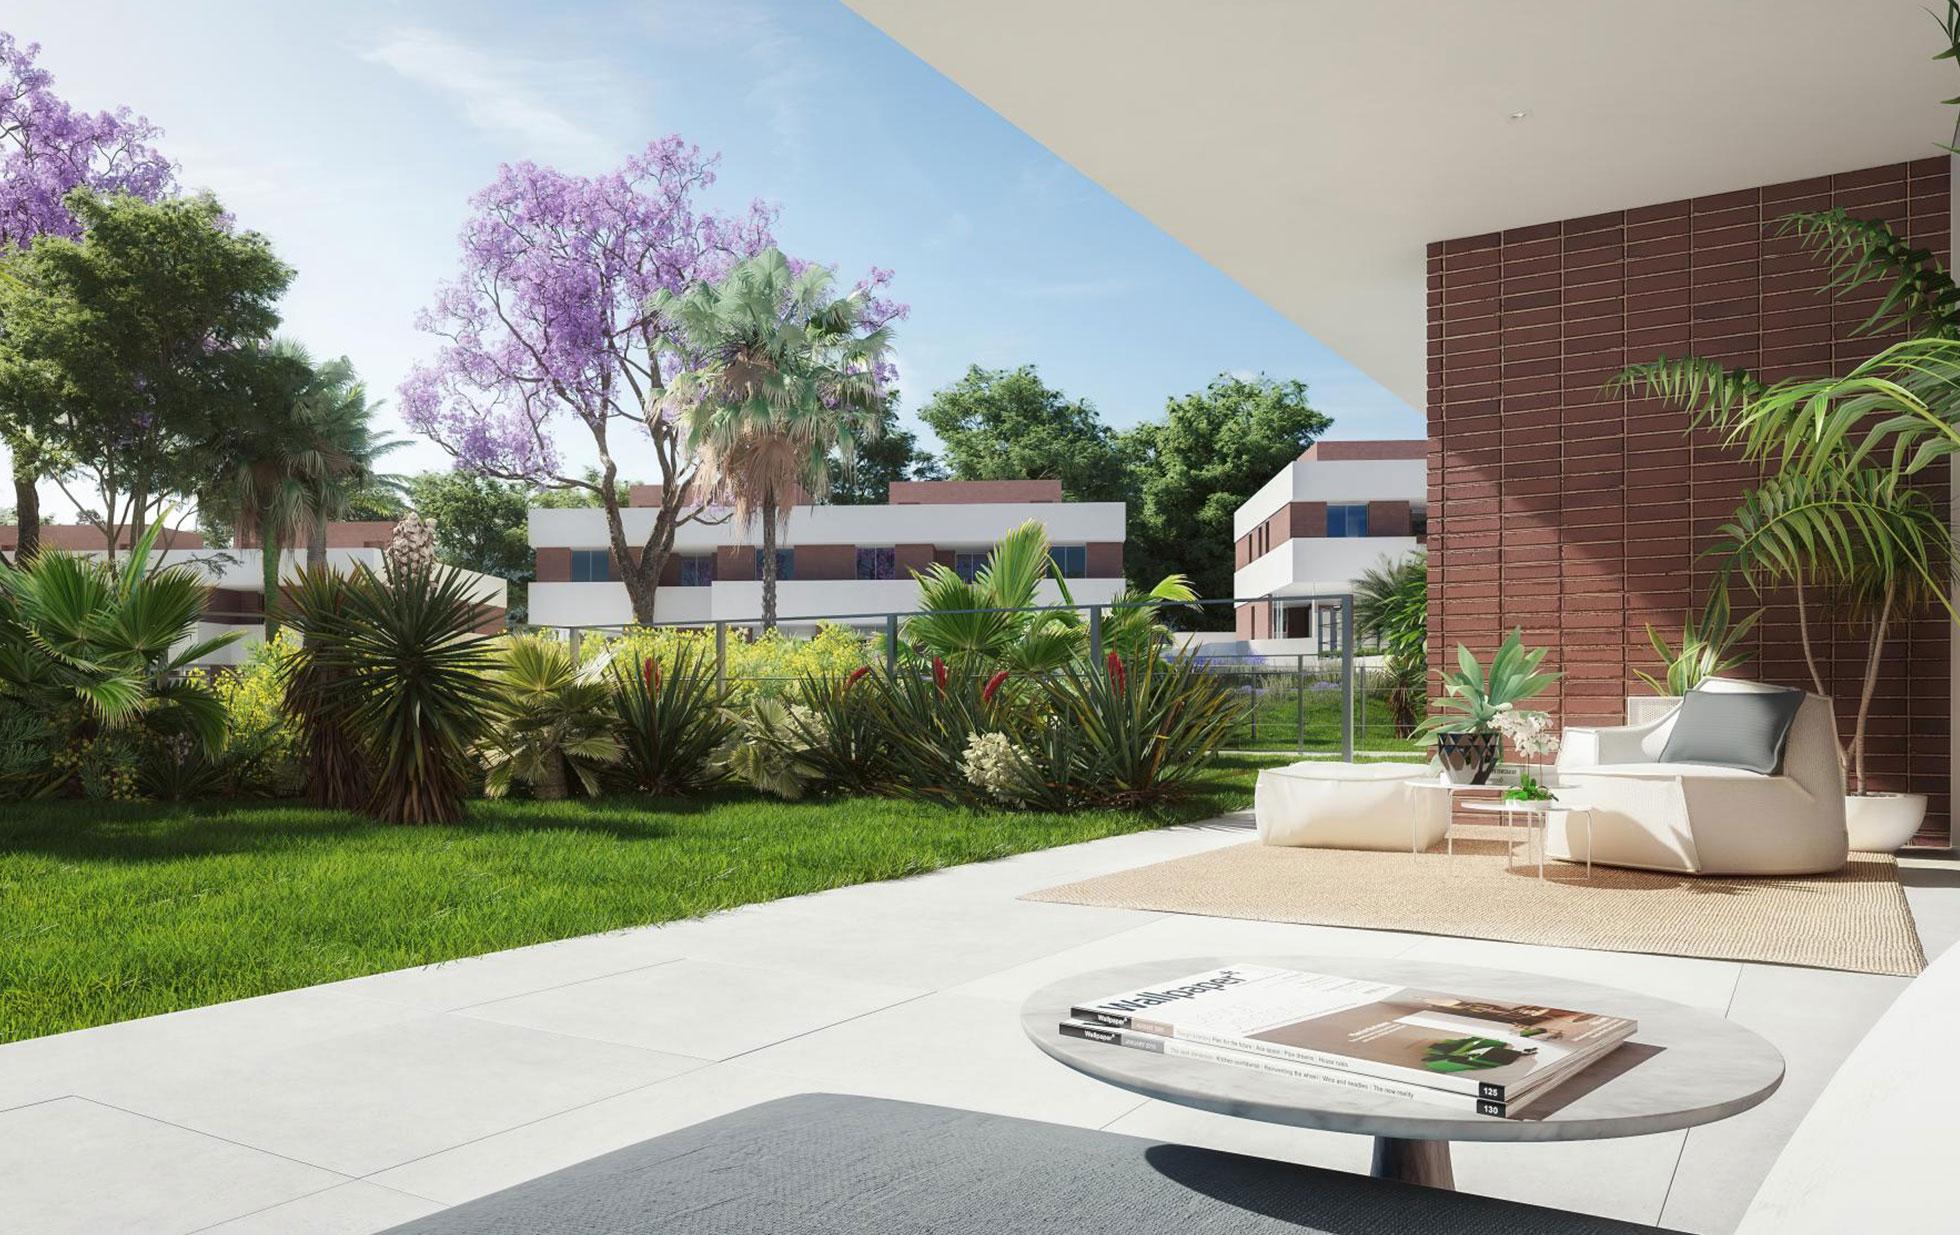 Residencial Santa Clara. Viviendas Pareadas. Arquitectos Alicante. eneseis Arquitectura